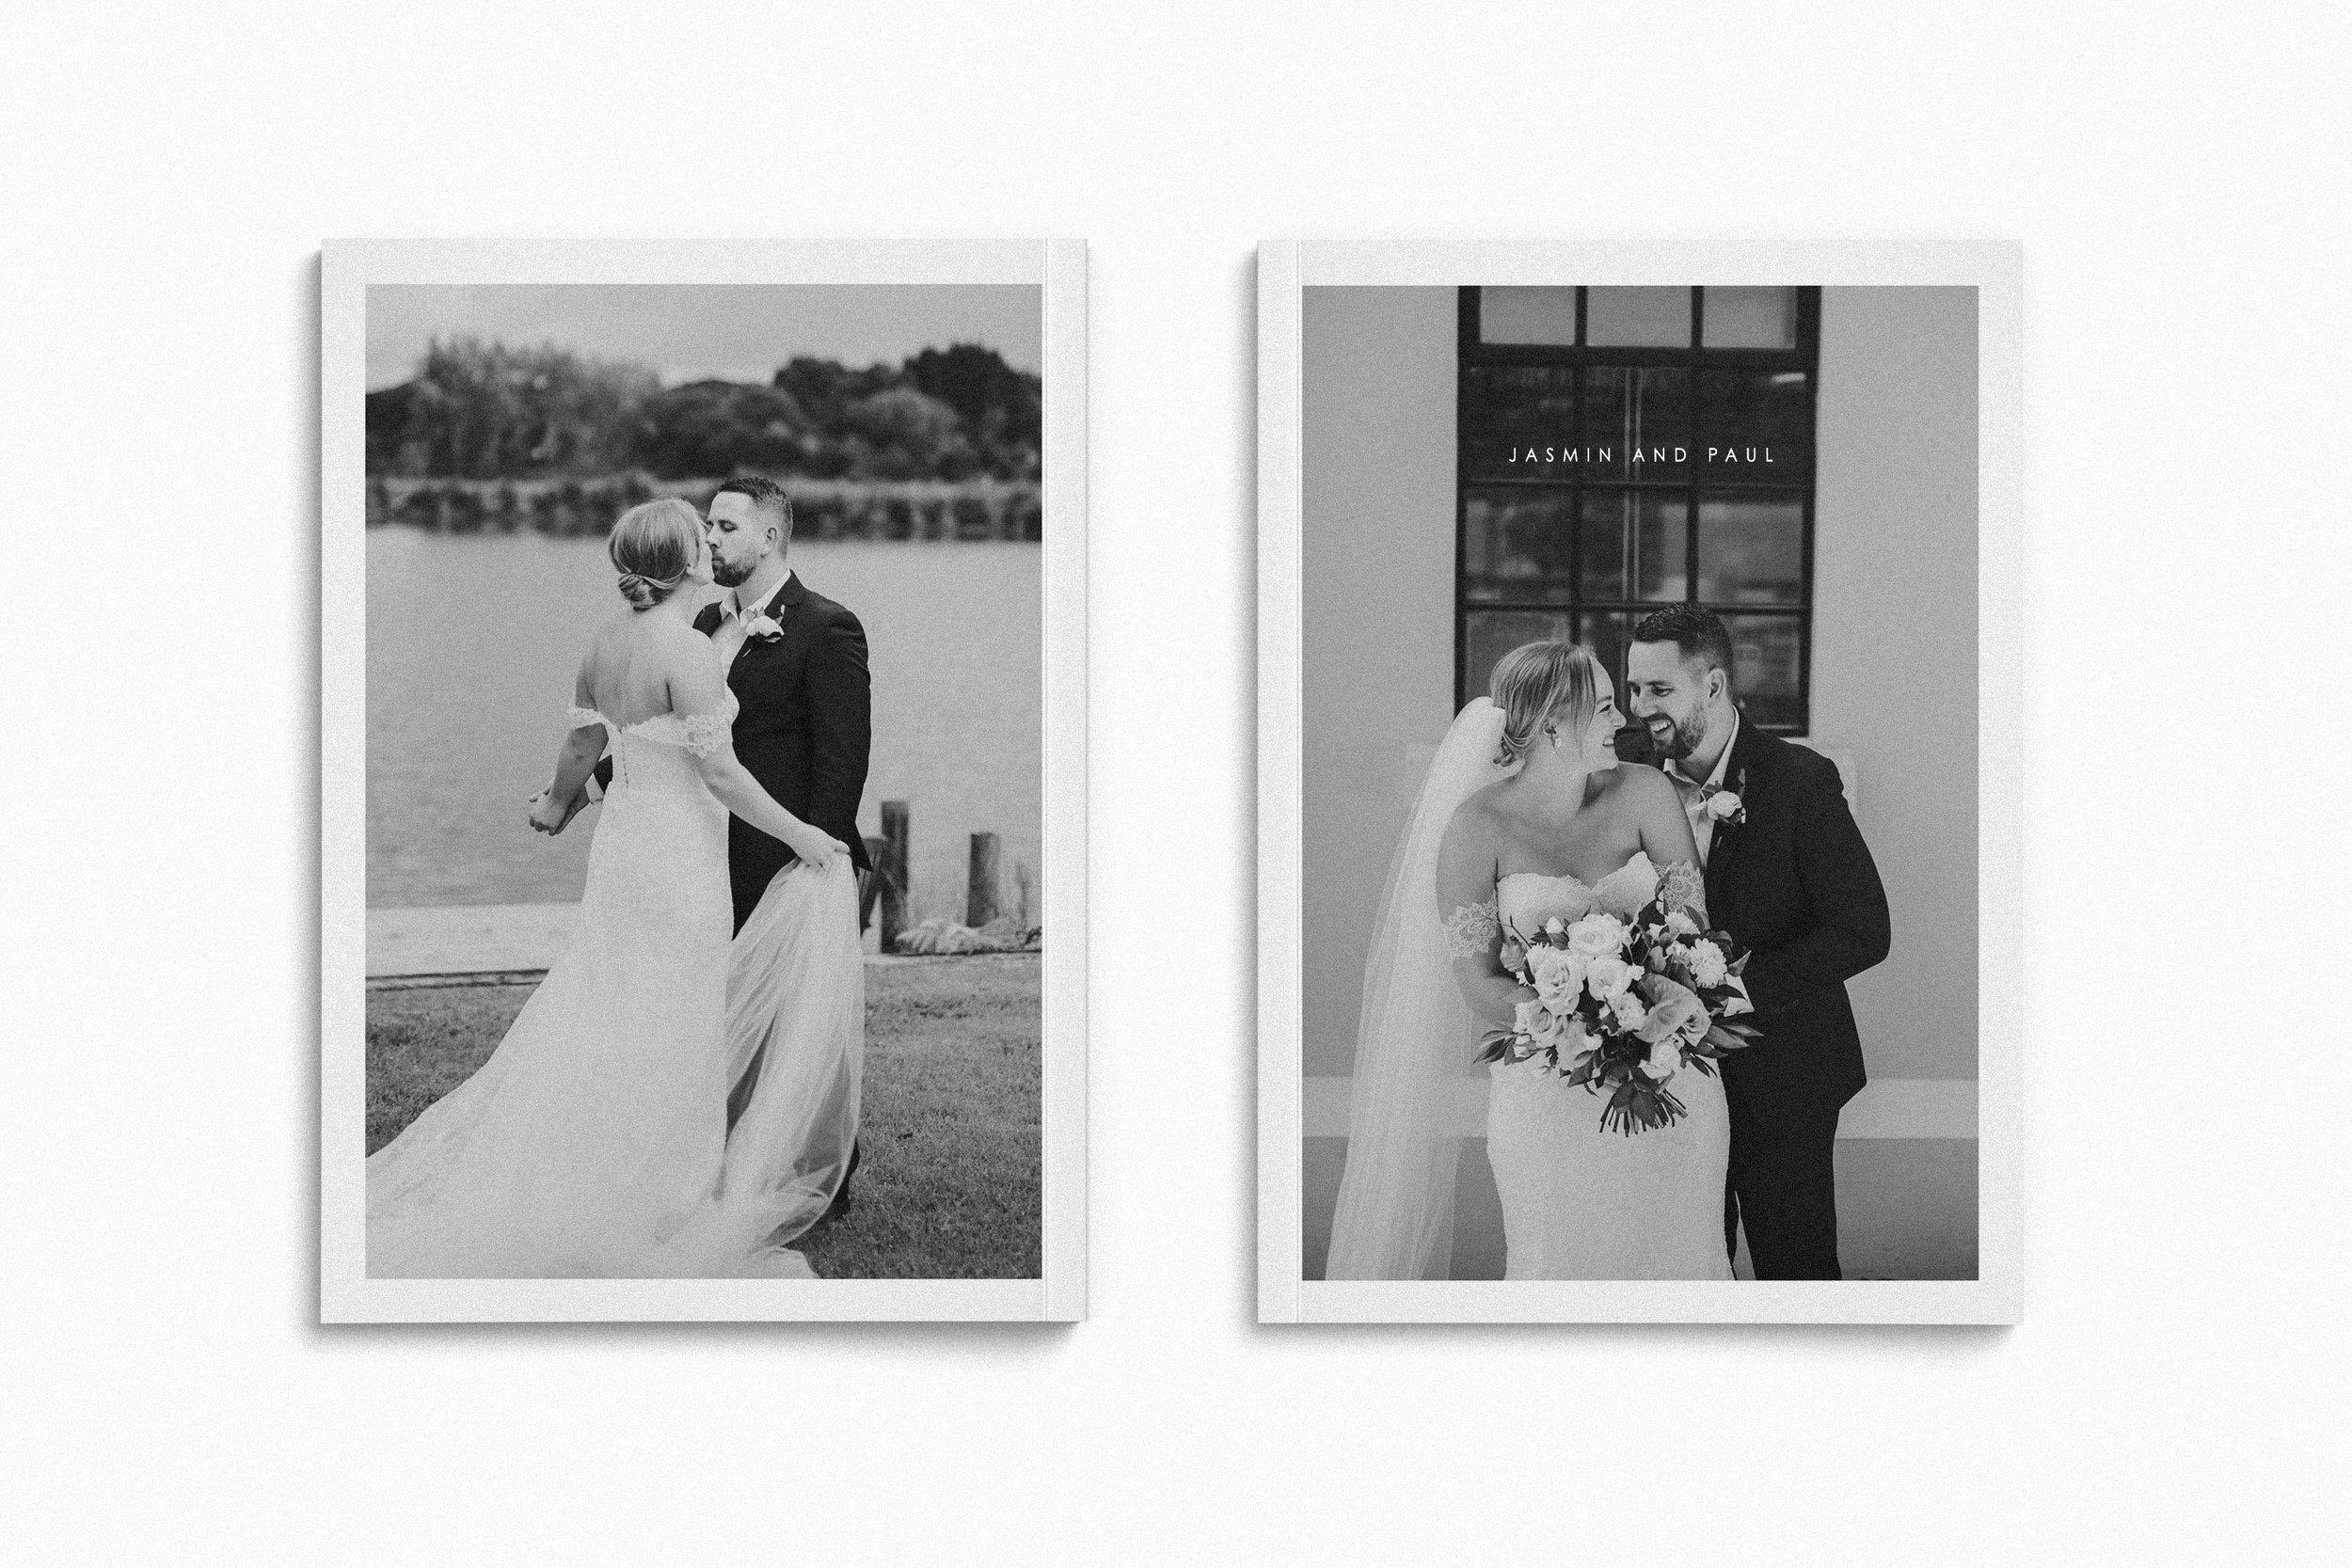 Jasmin-Paul-Wedding-Zine-Cover-Front-Back.png